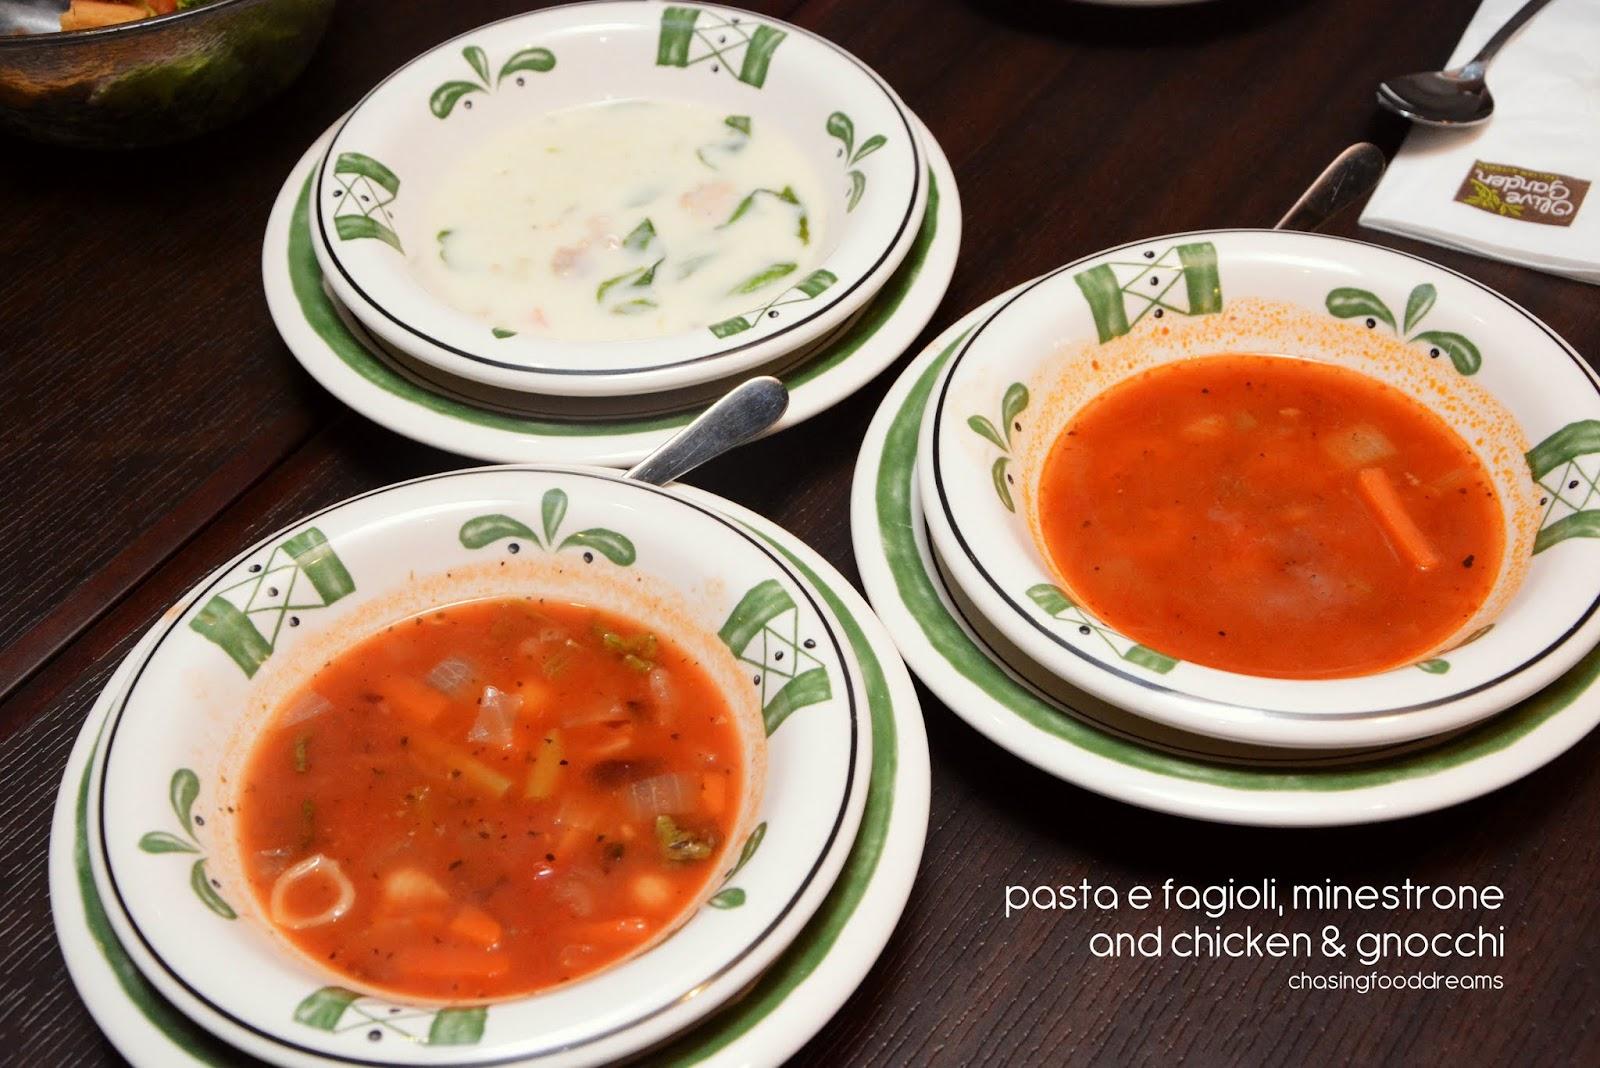 Olive Garden Kitchen Similiar Olive Garden Italian Kitchen Keywords